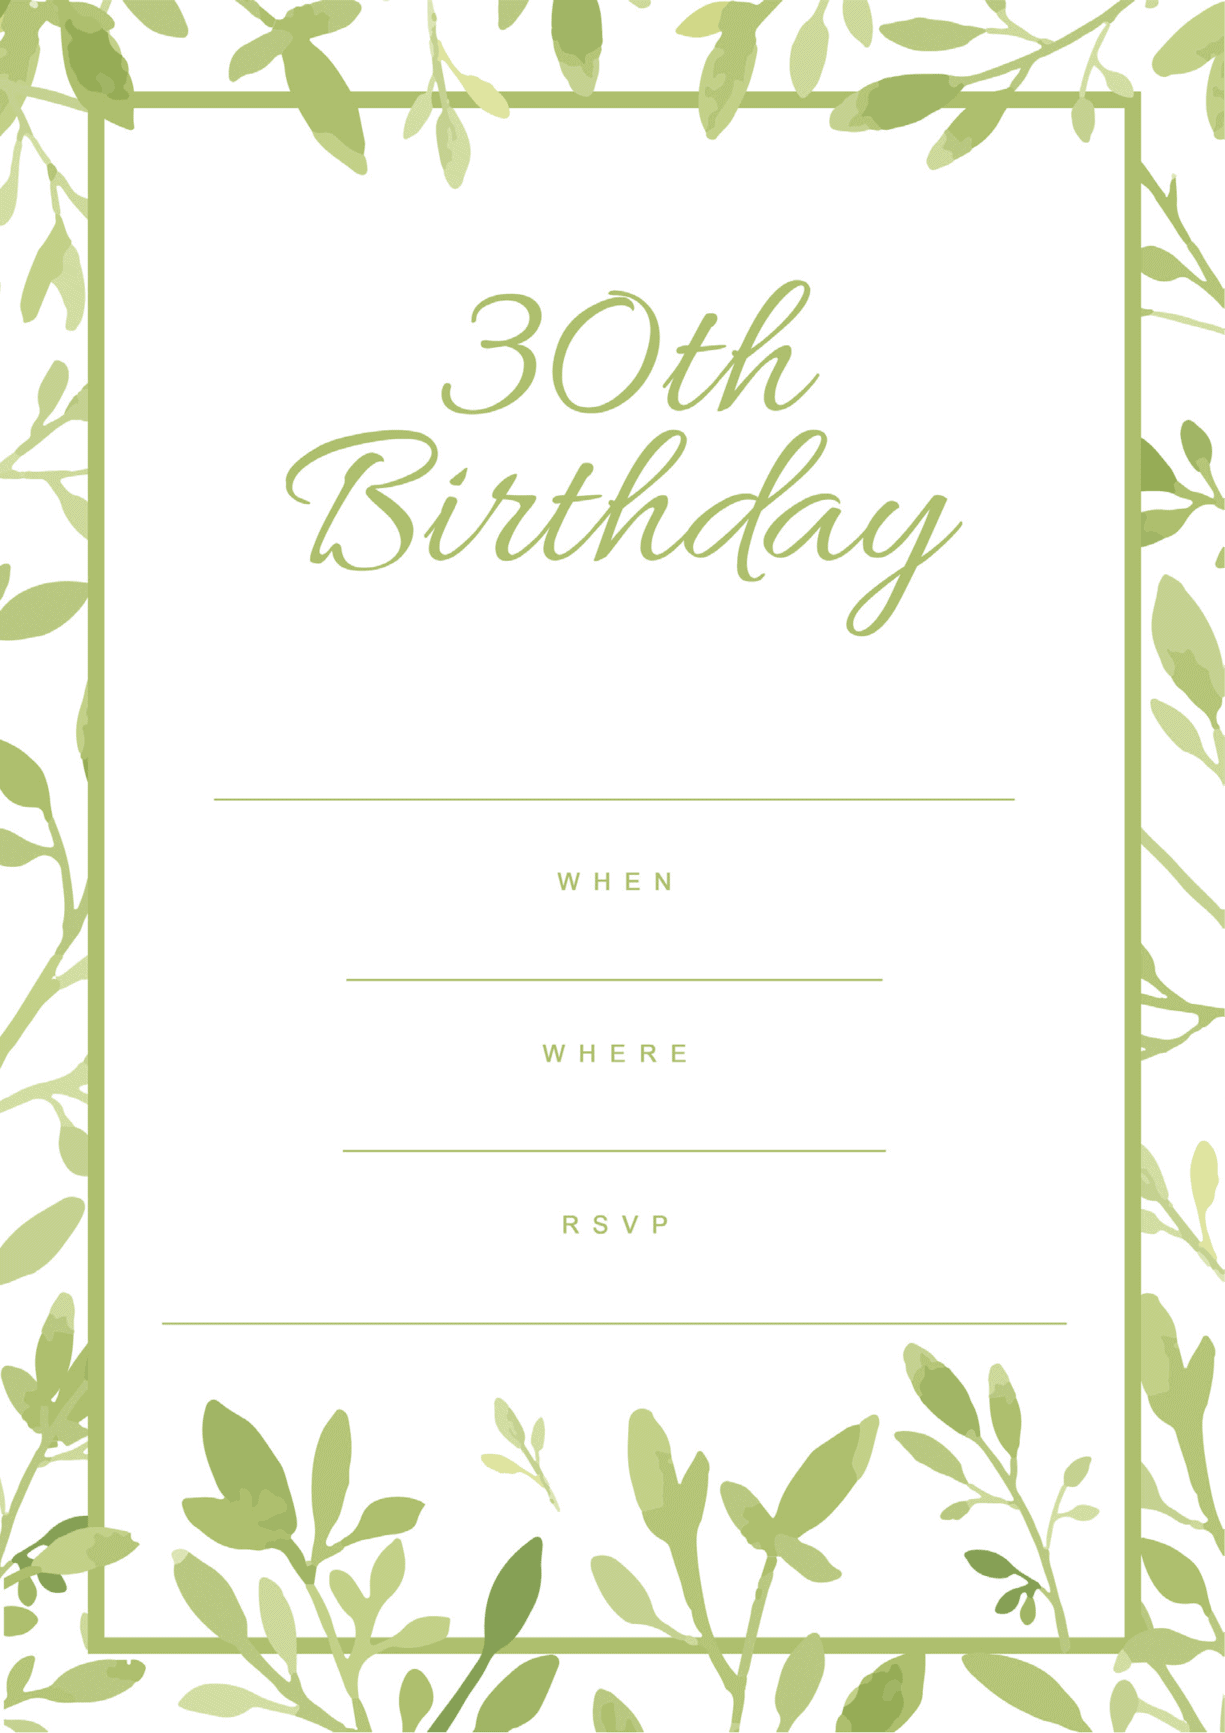 30th birthday green white design